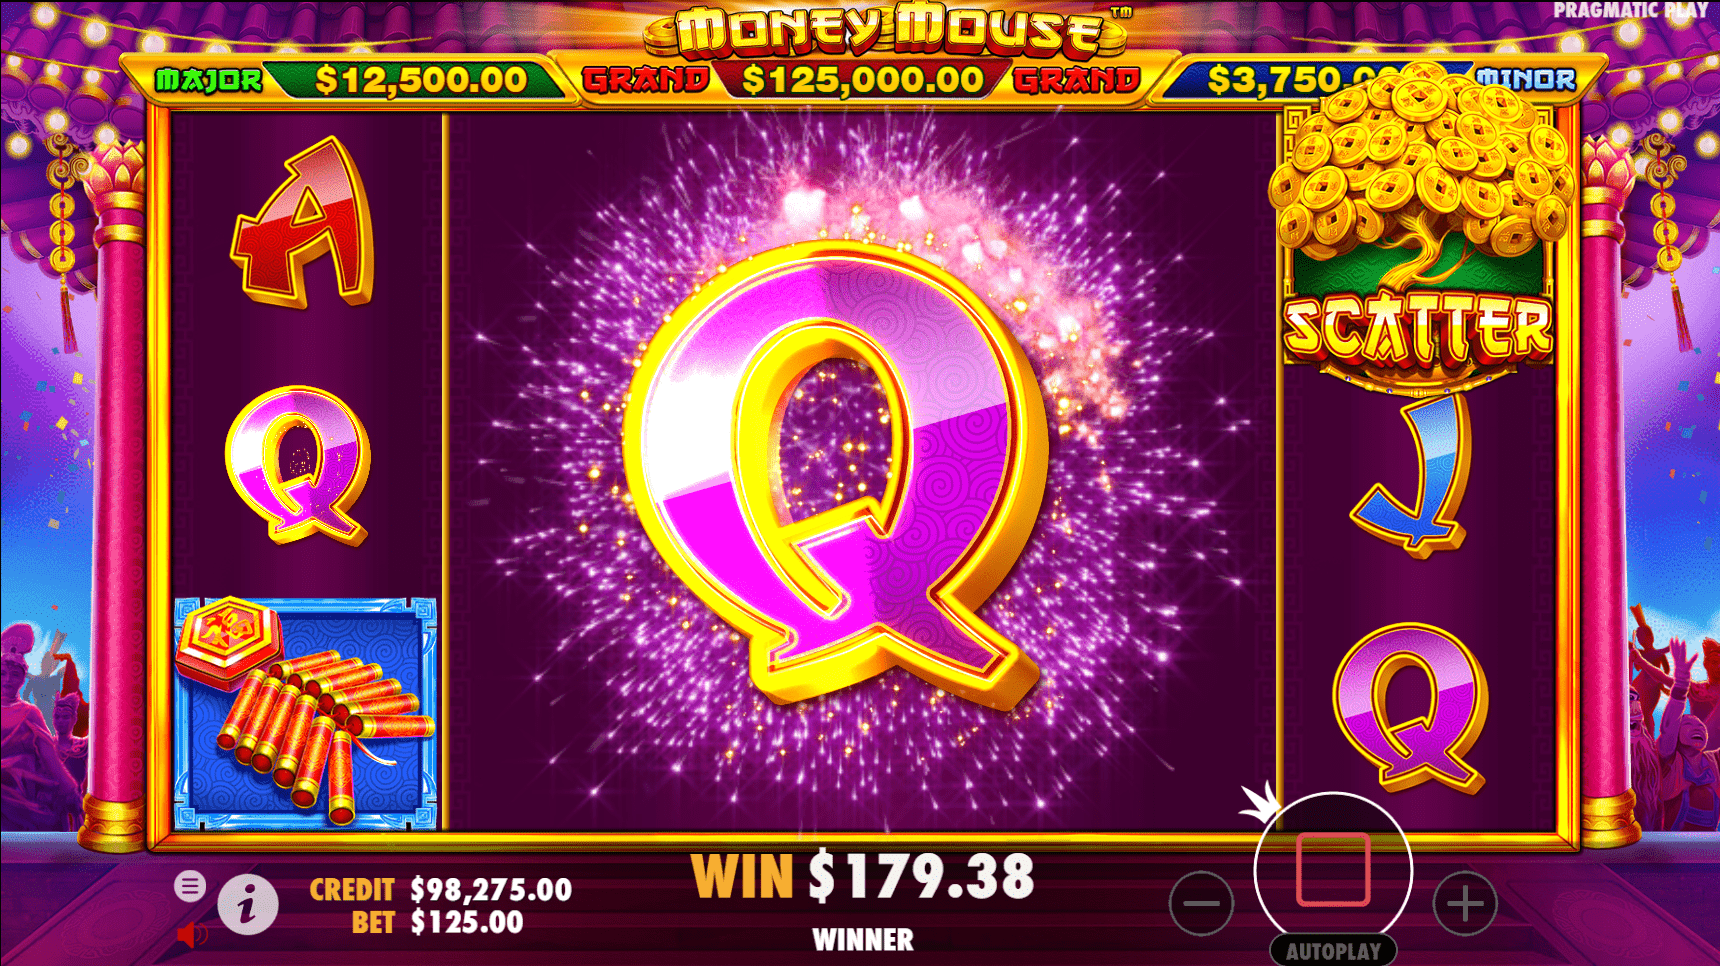 Money Mouse Slots Reels